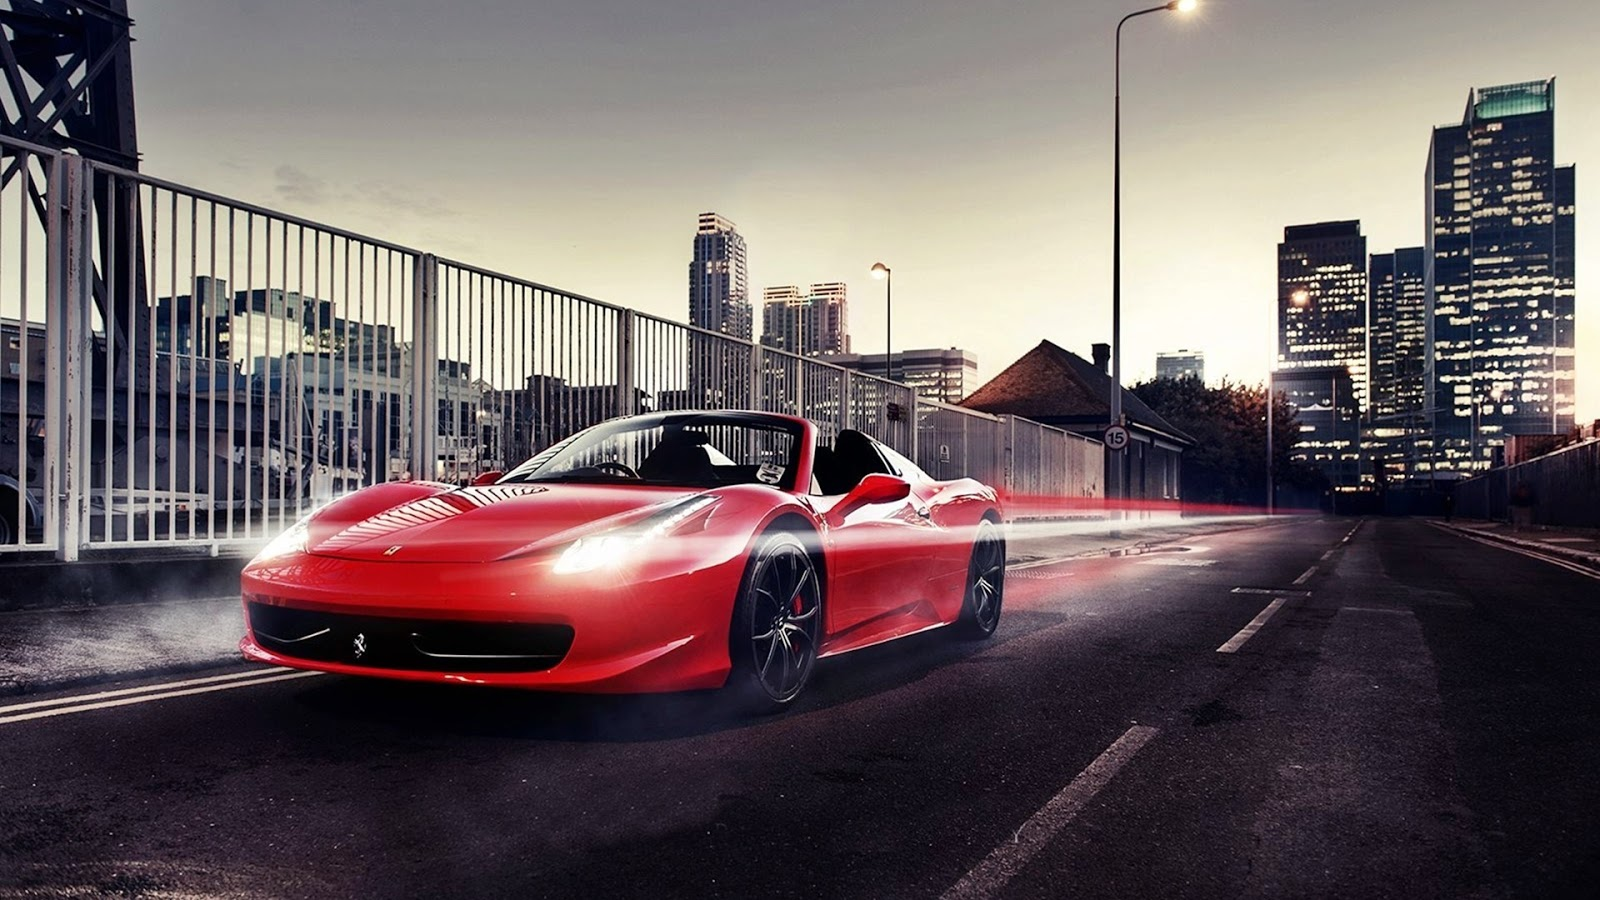 76 Ferrari 458 Wallpapers Wallpaperceiling